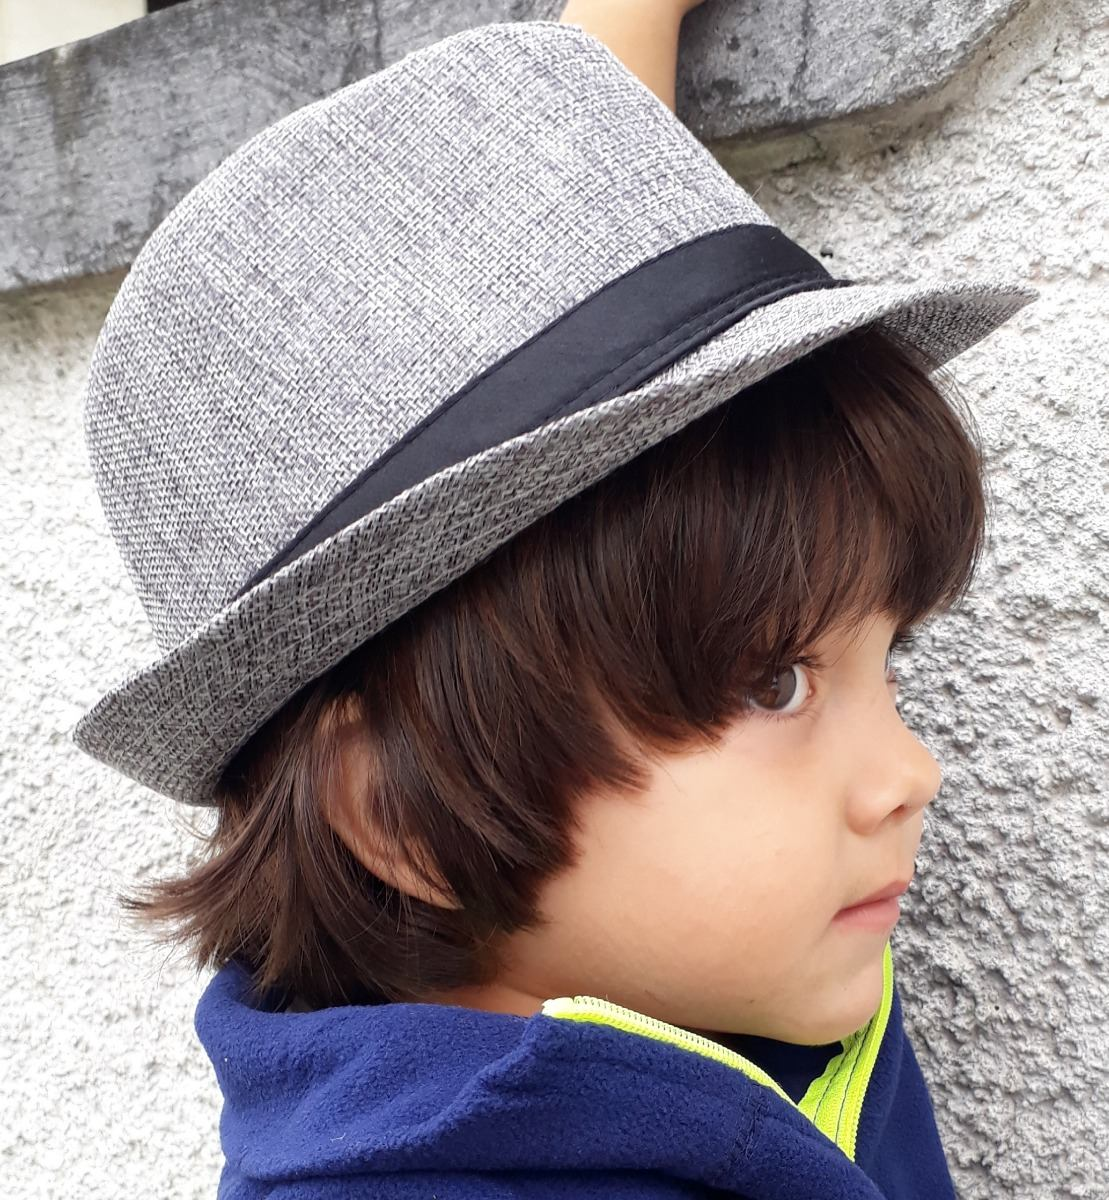 chapéu menino infantil panamá aba curta atacado. Carregando zoom. 050c797d4f2